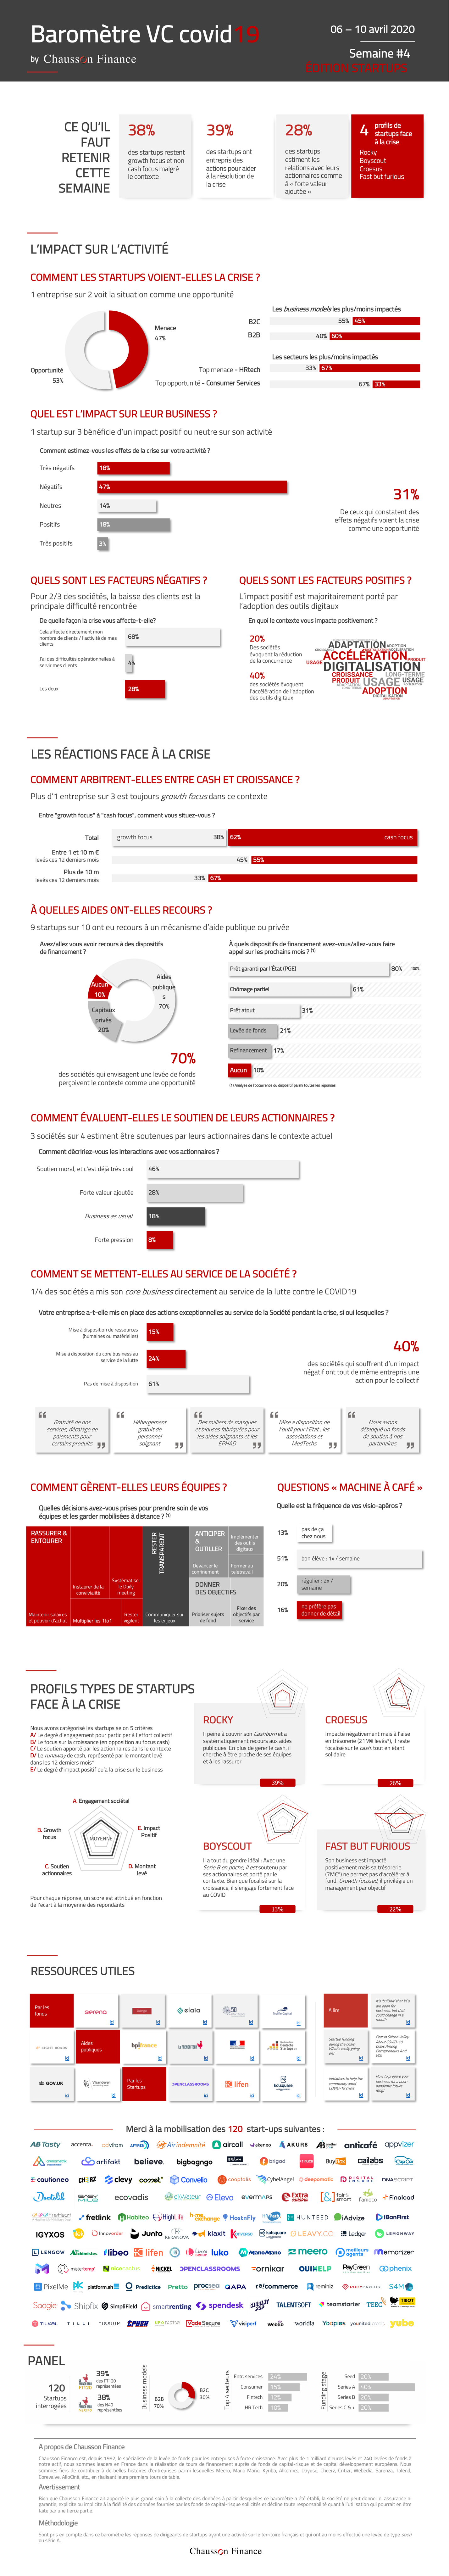 Baromètre VC Covid19 : spécial startups